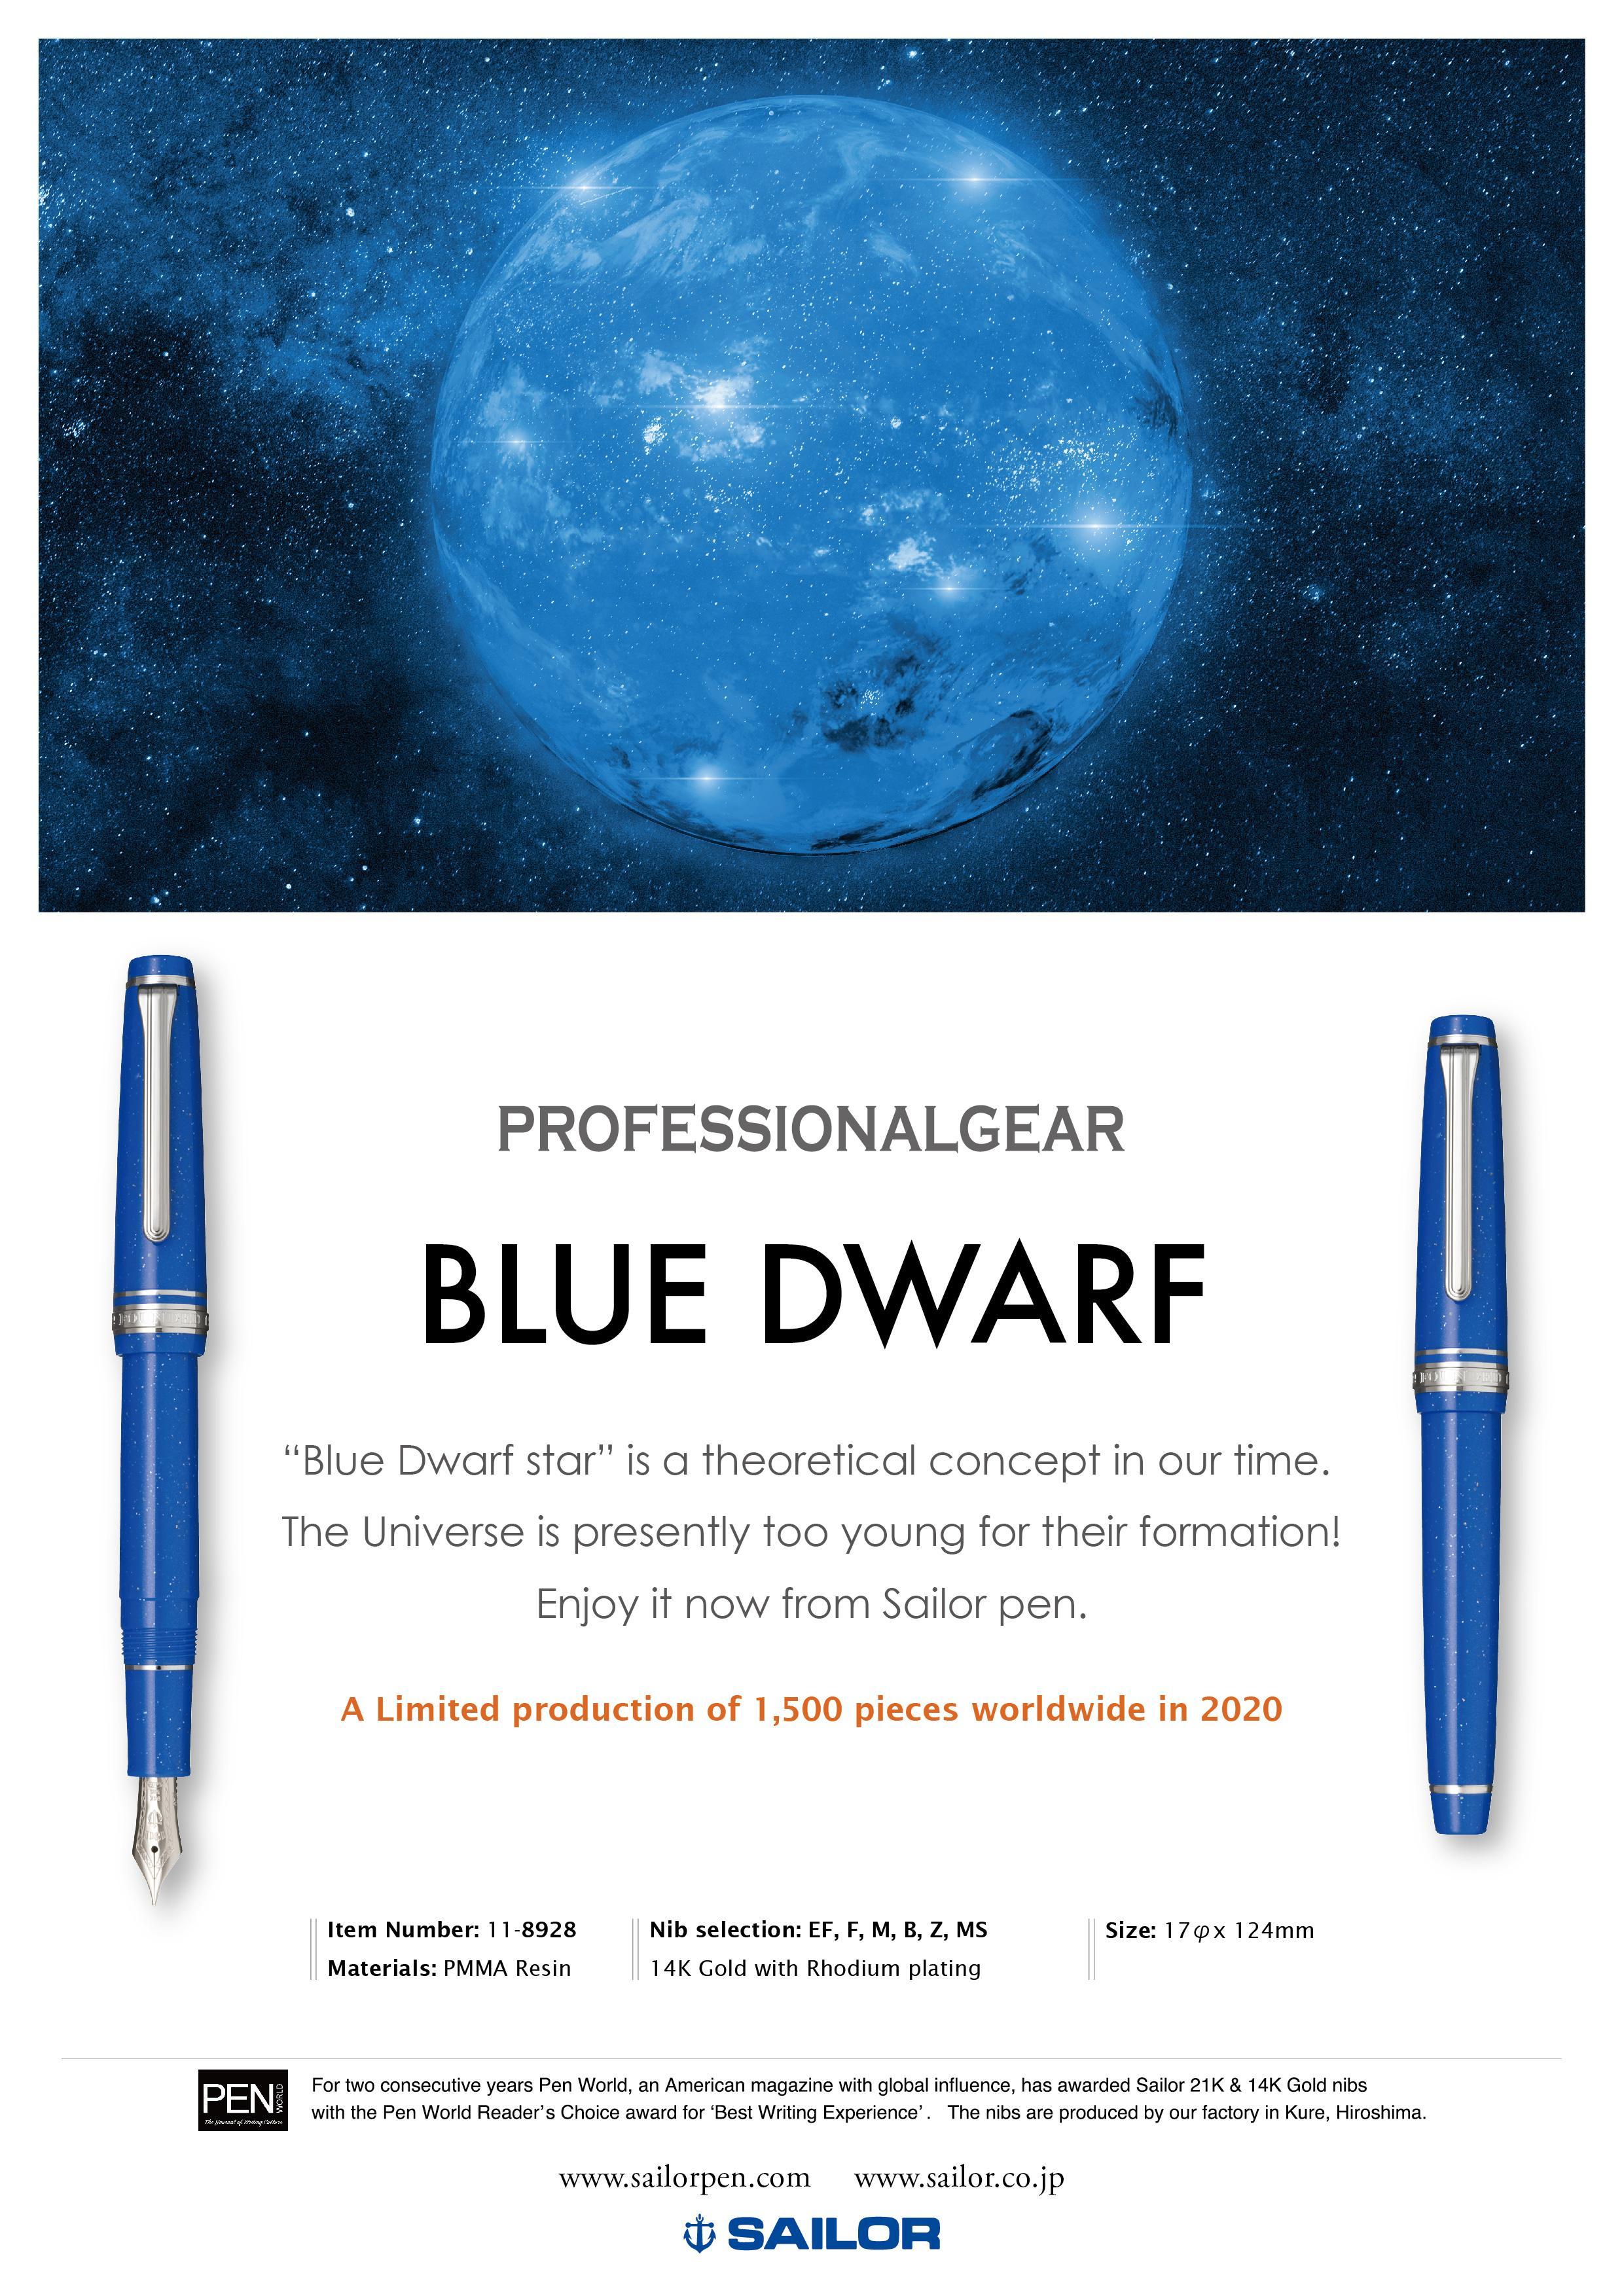 Sailor Professional Gear Slim - Blue Dwarf